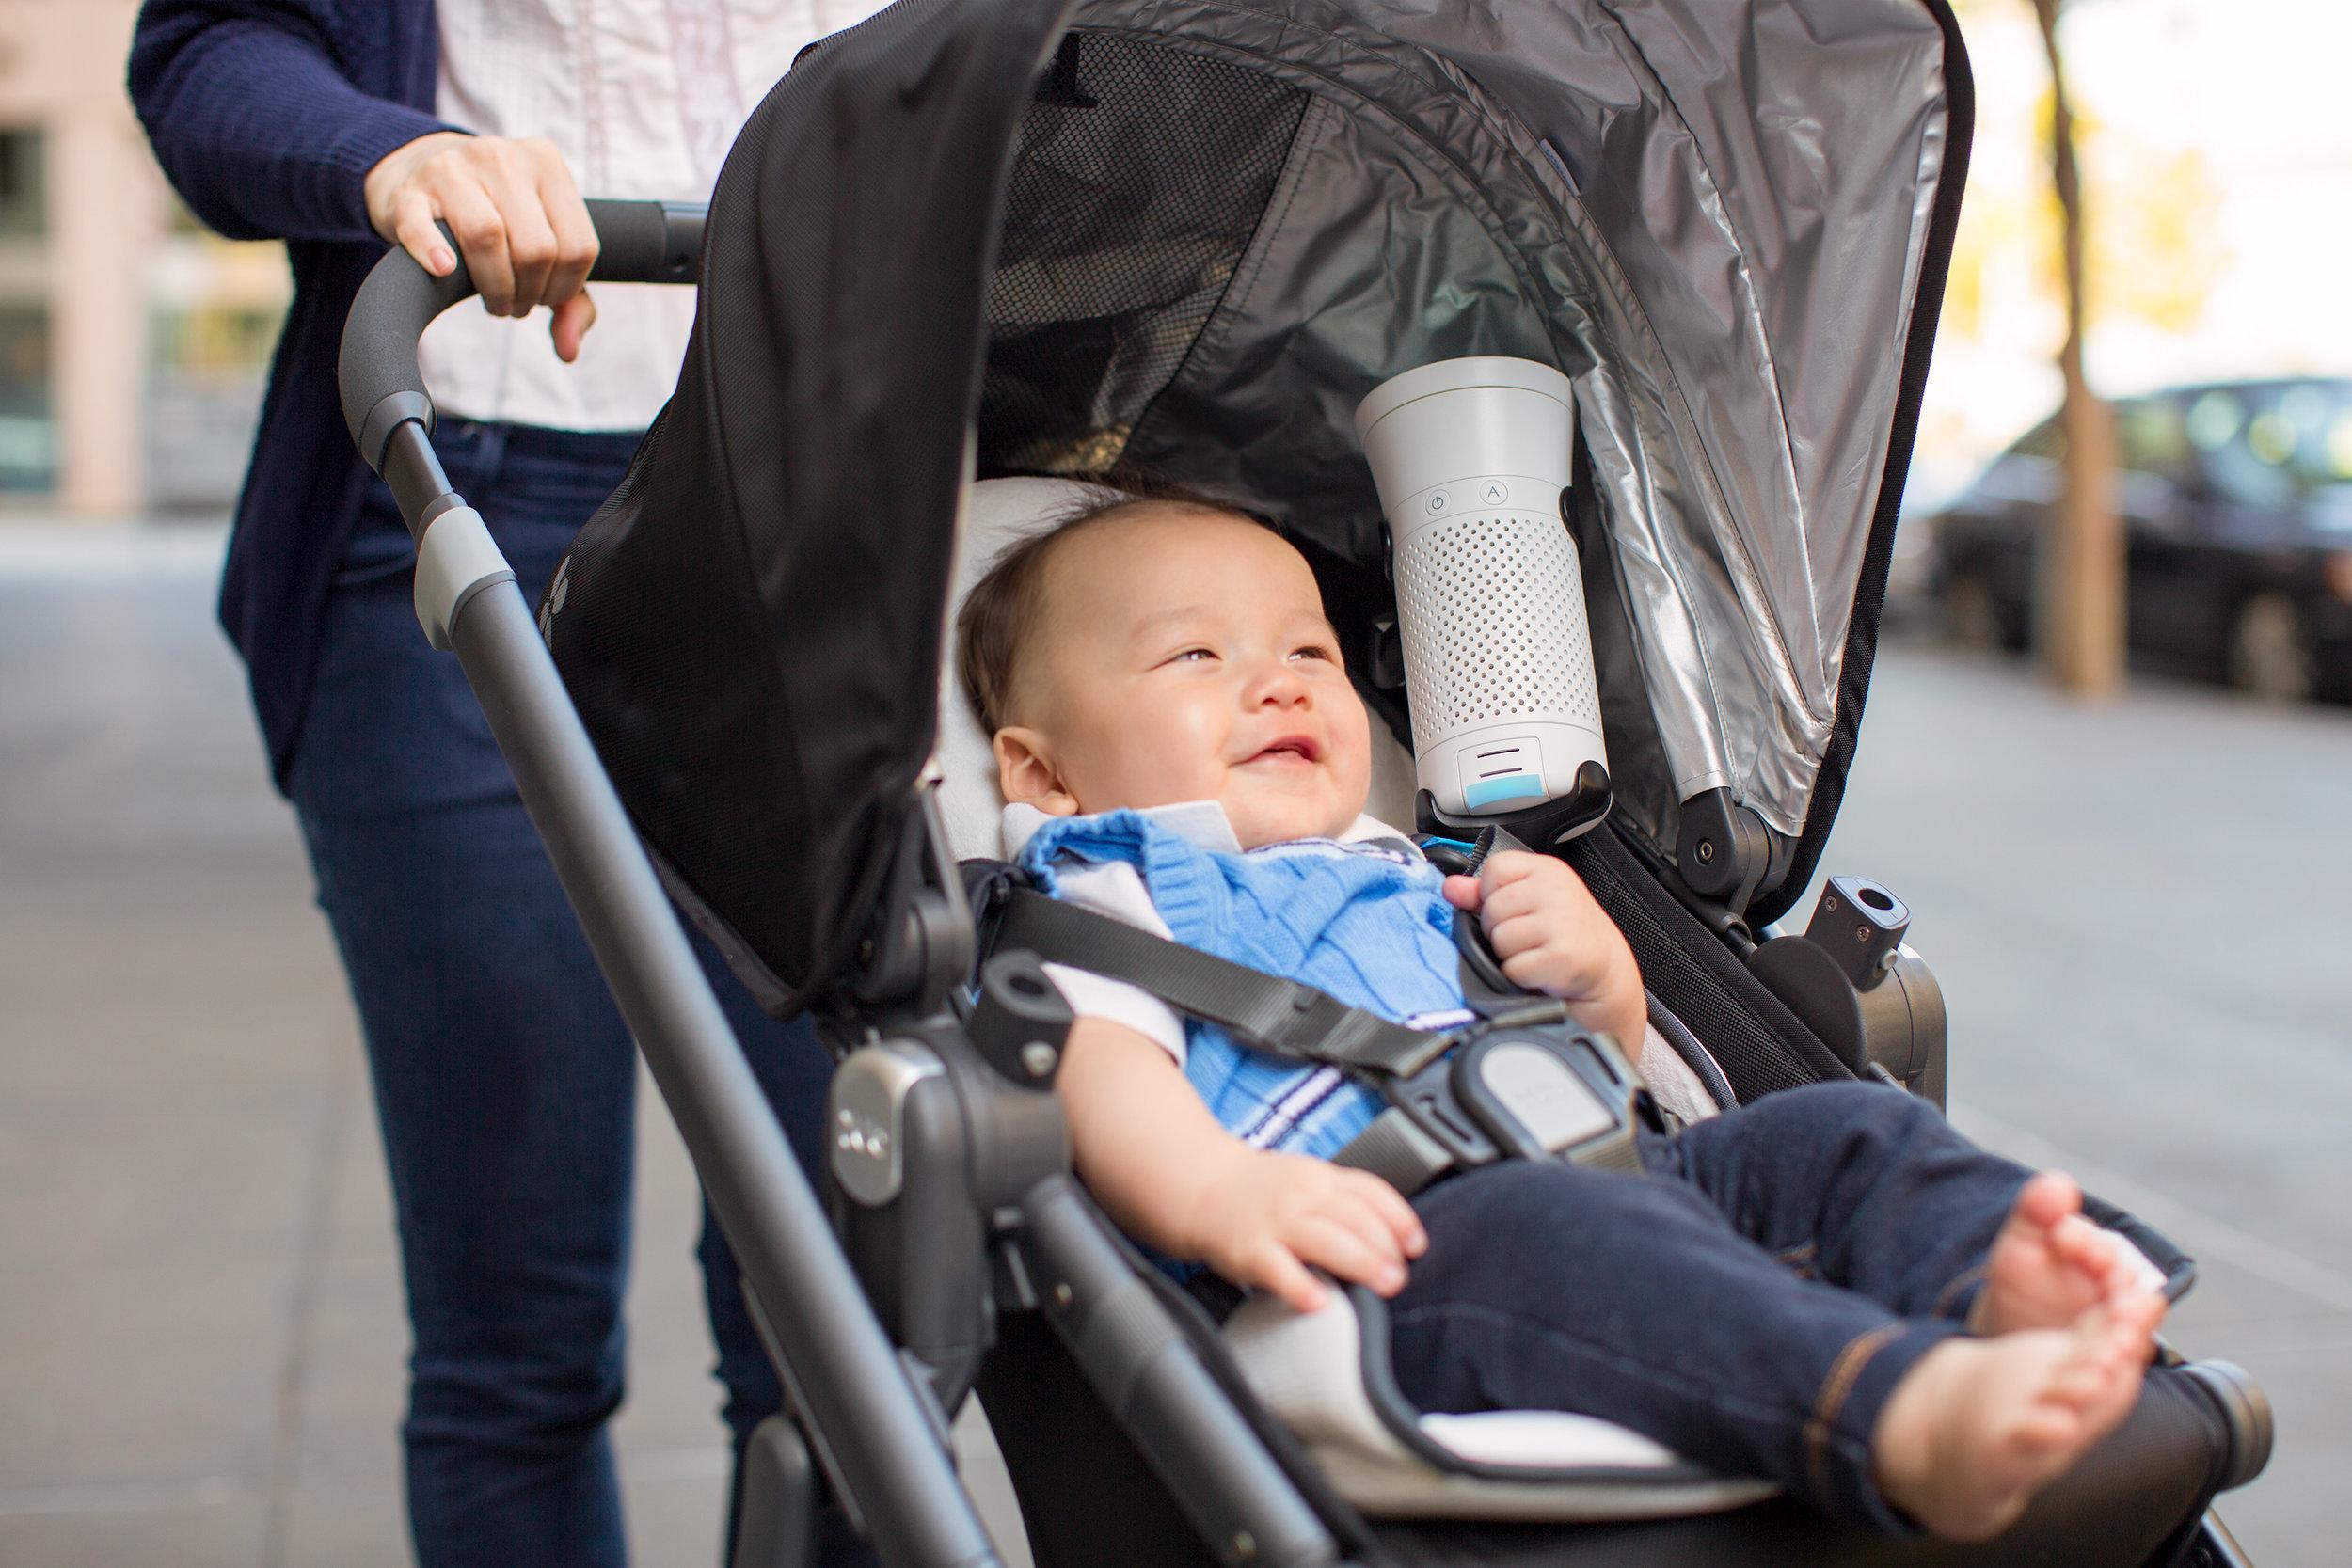 wynd_in_baby_stroller.jpg